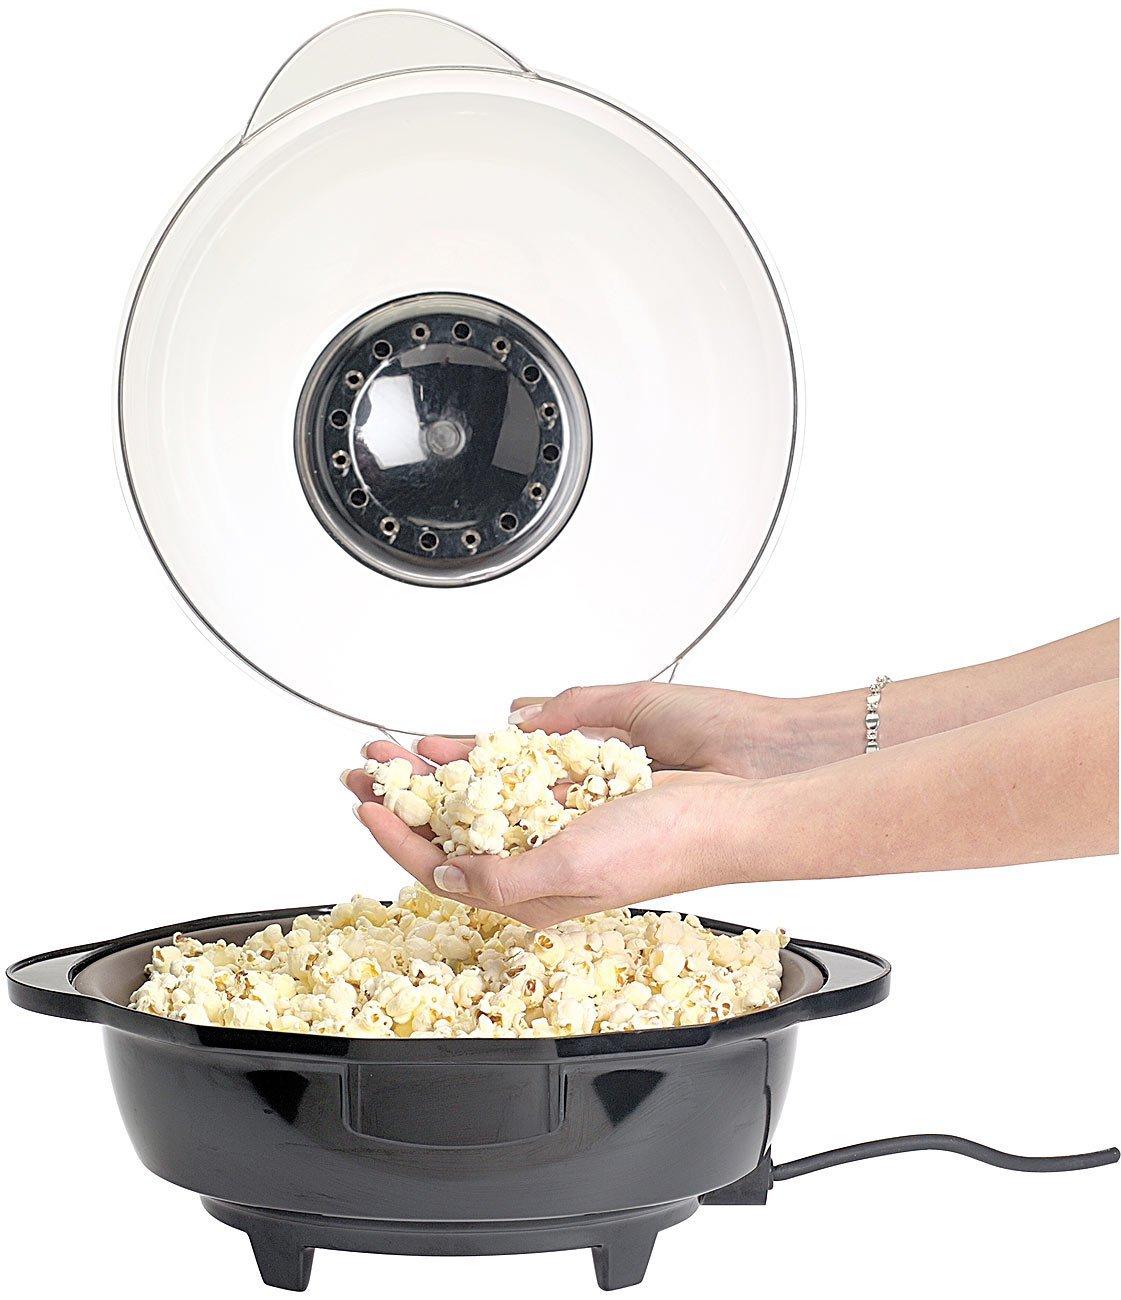 Heizplatte_Popcornmaschine_Bild_3